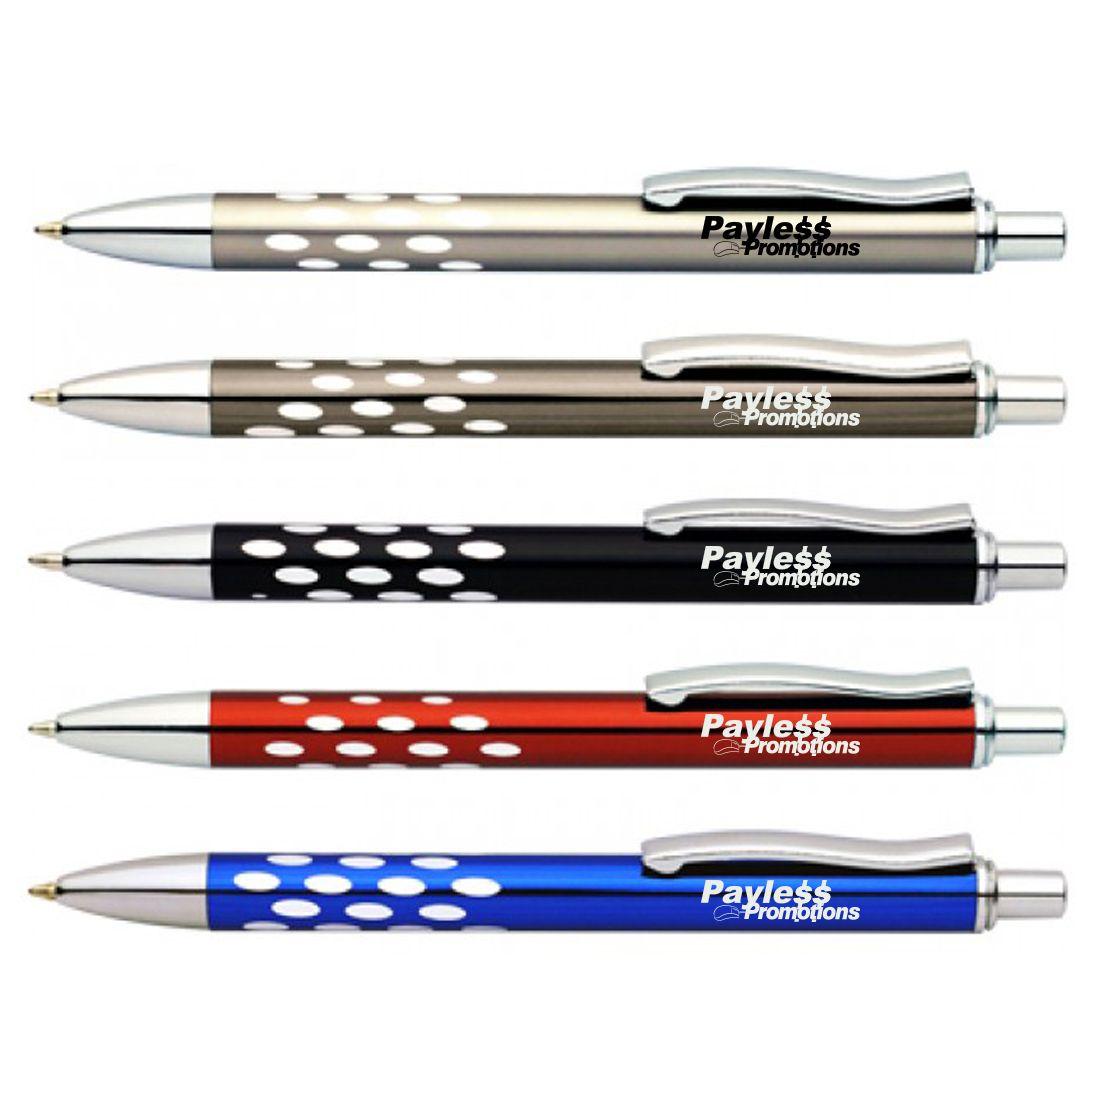 P224 Snowflake Printed Gift Pens